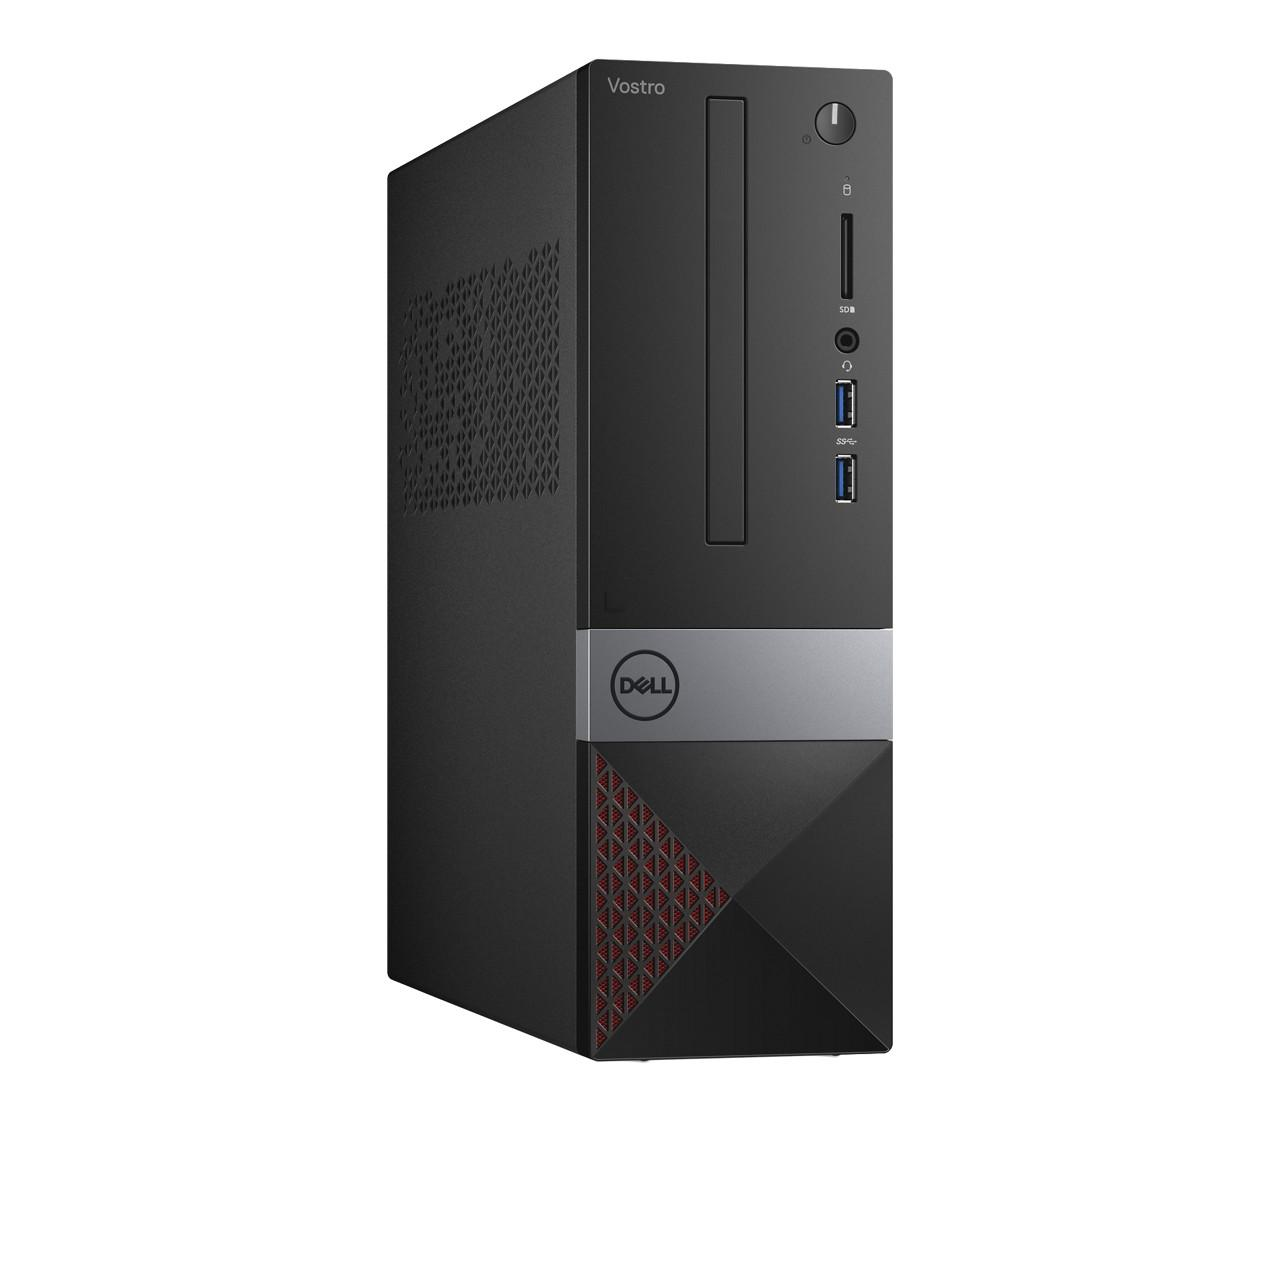 Máy tính để bàn Dell Vostro 3470 (Intel Core i5-8400...